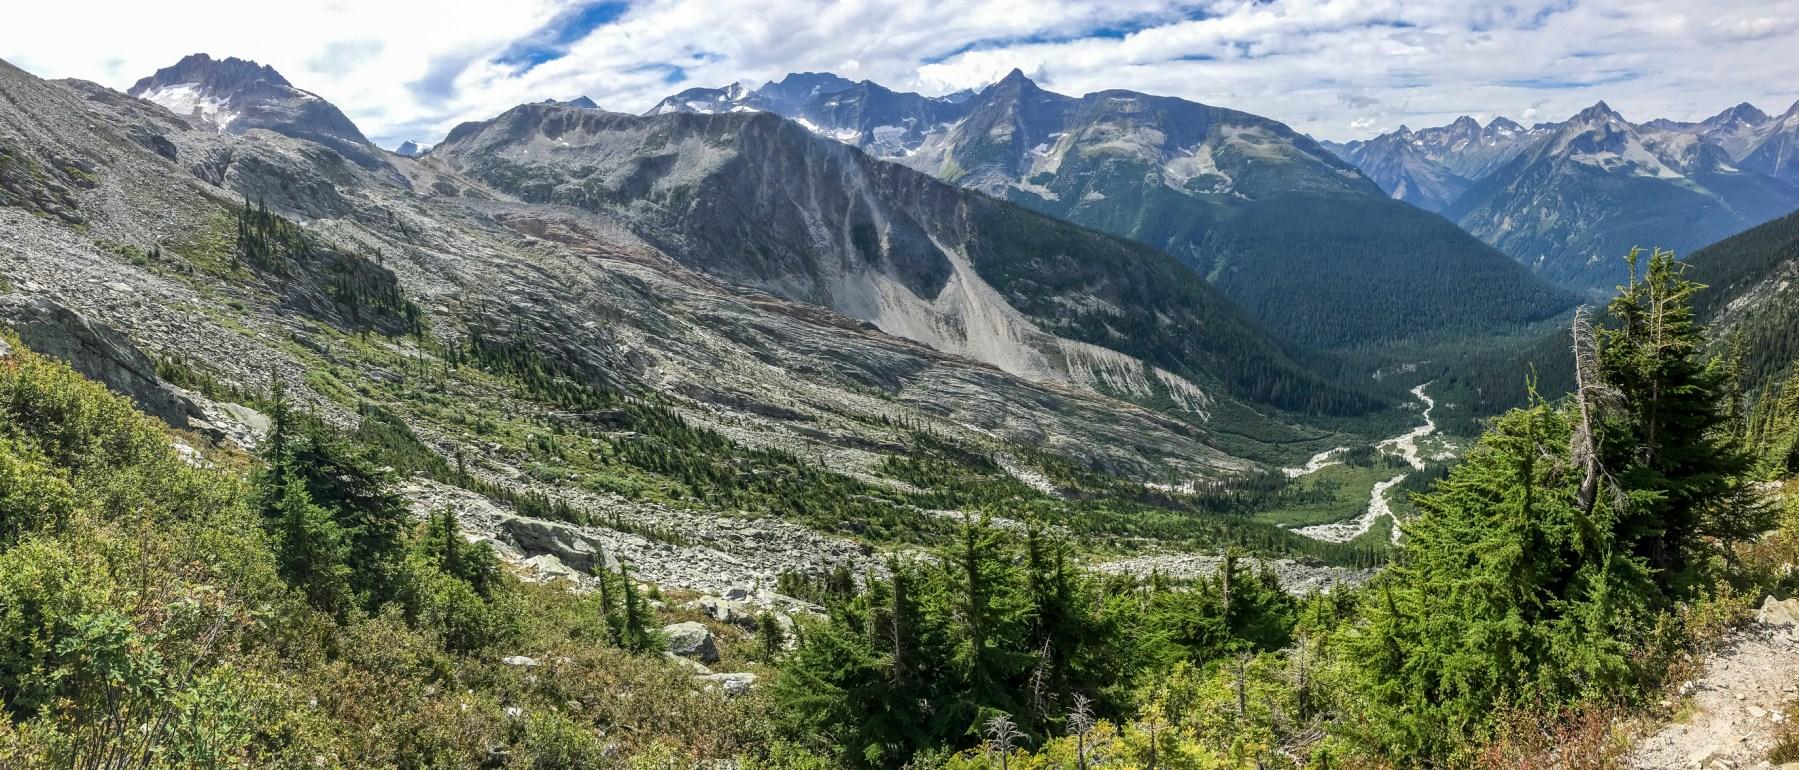 Mountain West depression